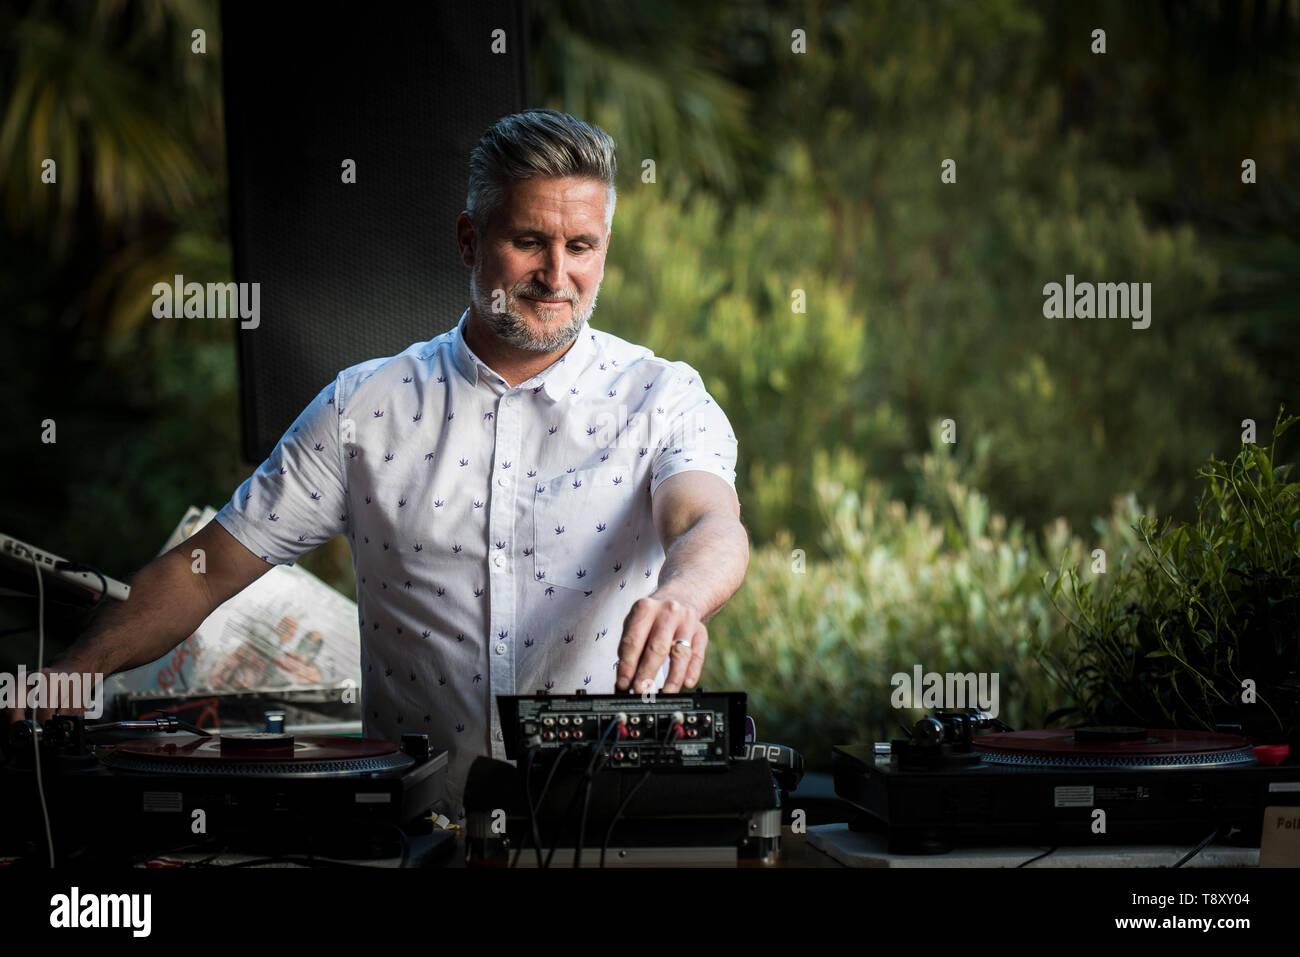 A DJ playing music at Trebah Garden in Cornwall. - Stock Image